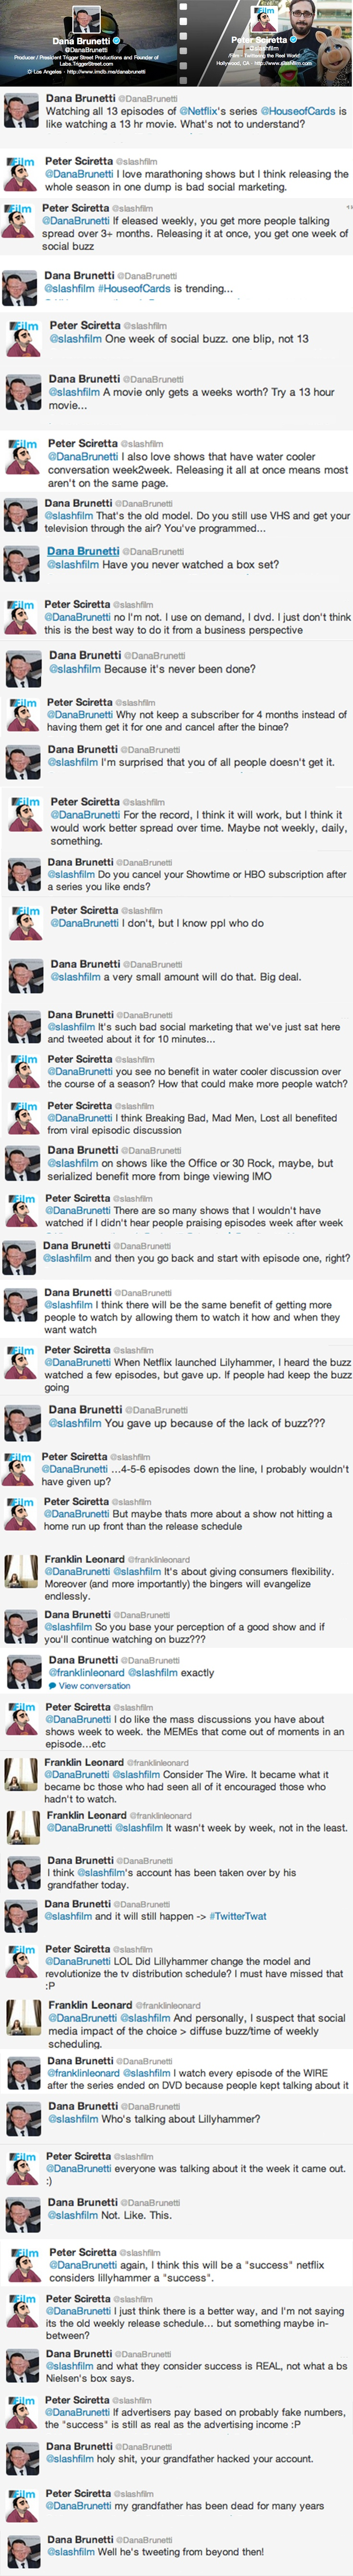 Slash Film vs Brunetti Does It Make Sense to Release House of Cards at Once on Netflix? The Slash Film vs Dana Brunetti Debate